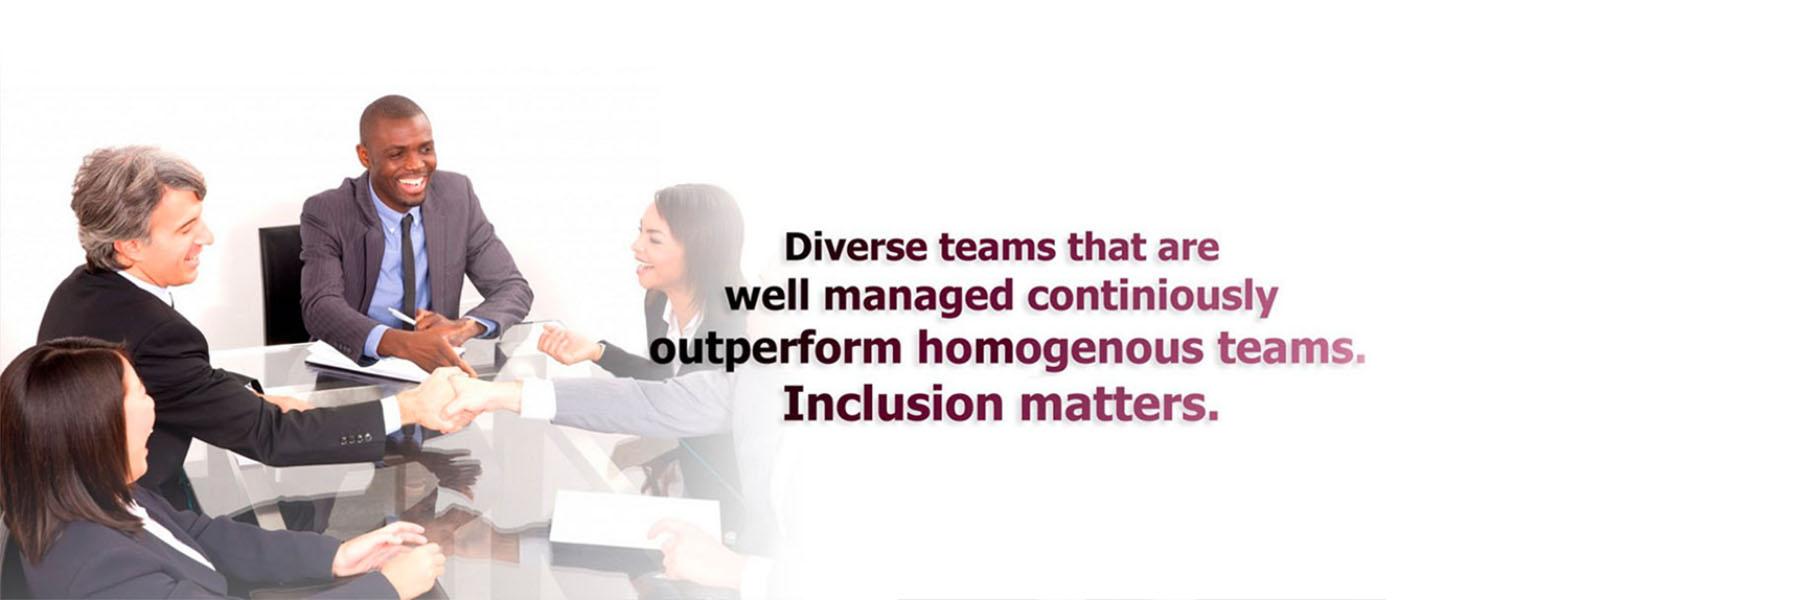 slide-3-3×1-executive-diversity-training-slider-images